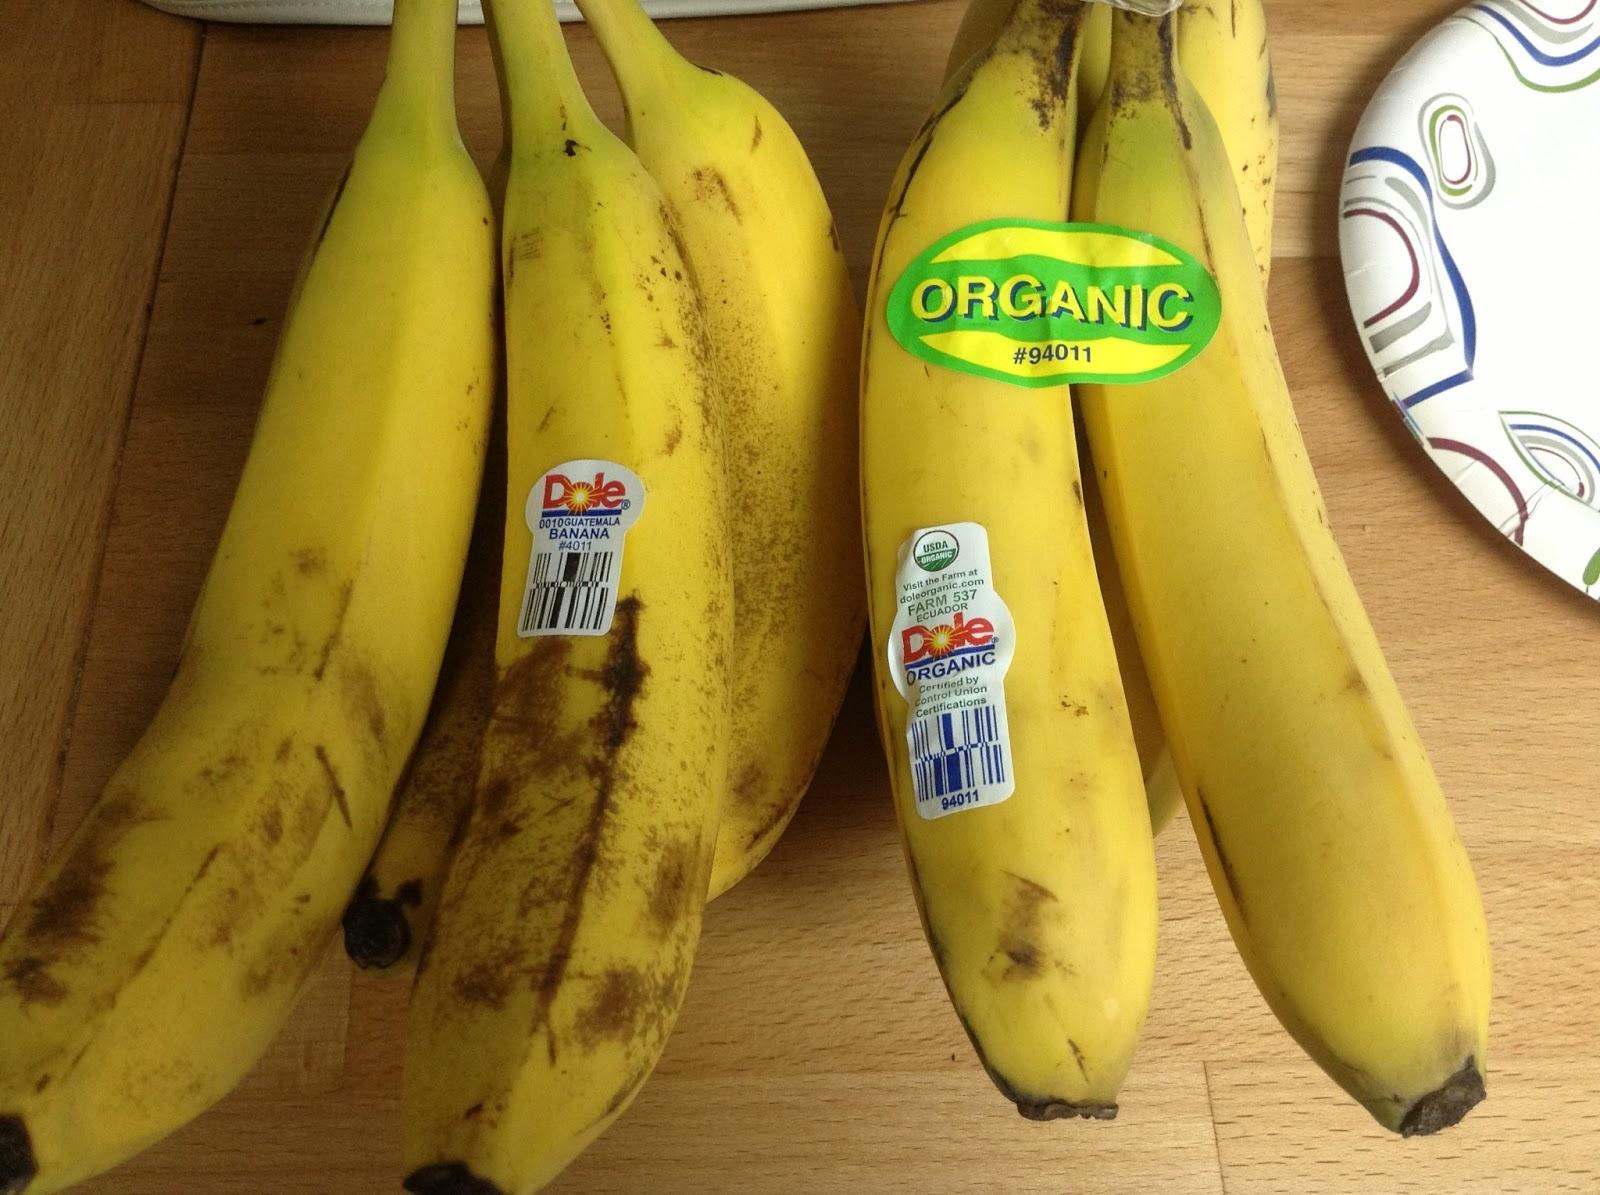 organic foods vs non organic foods essay